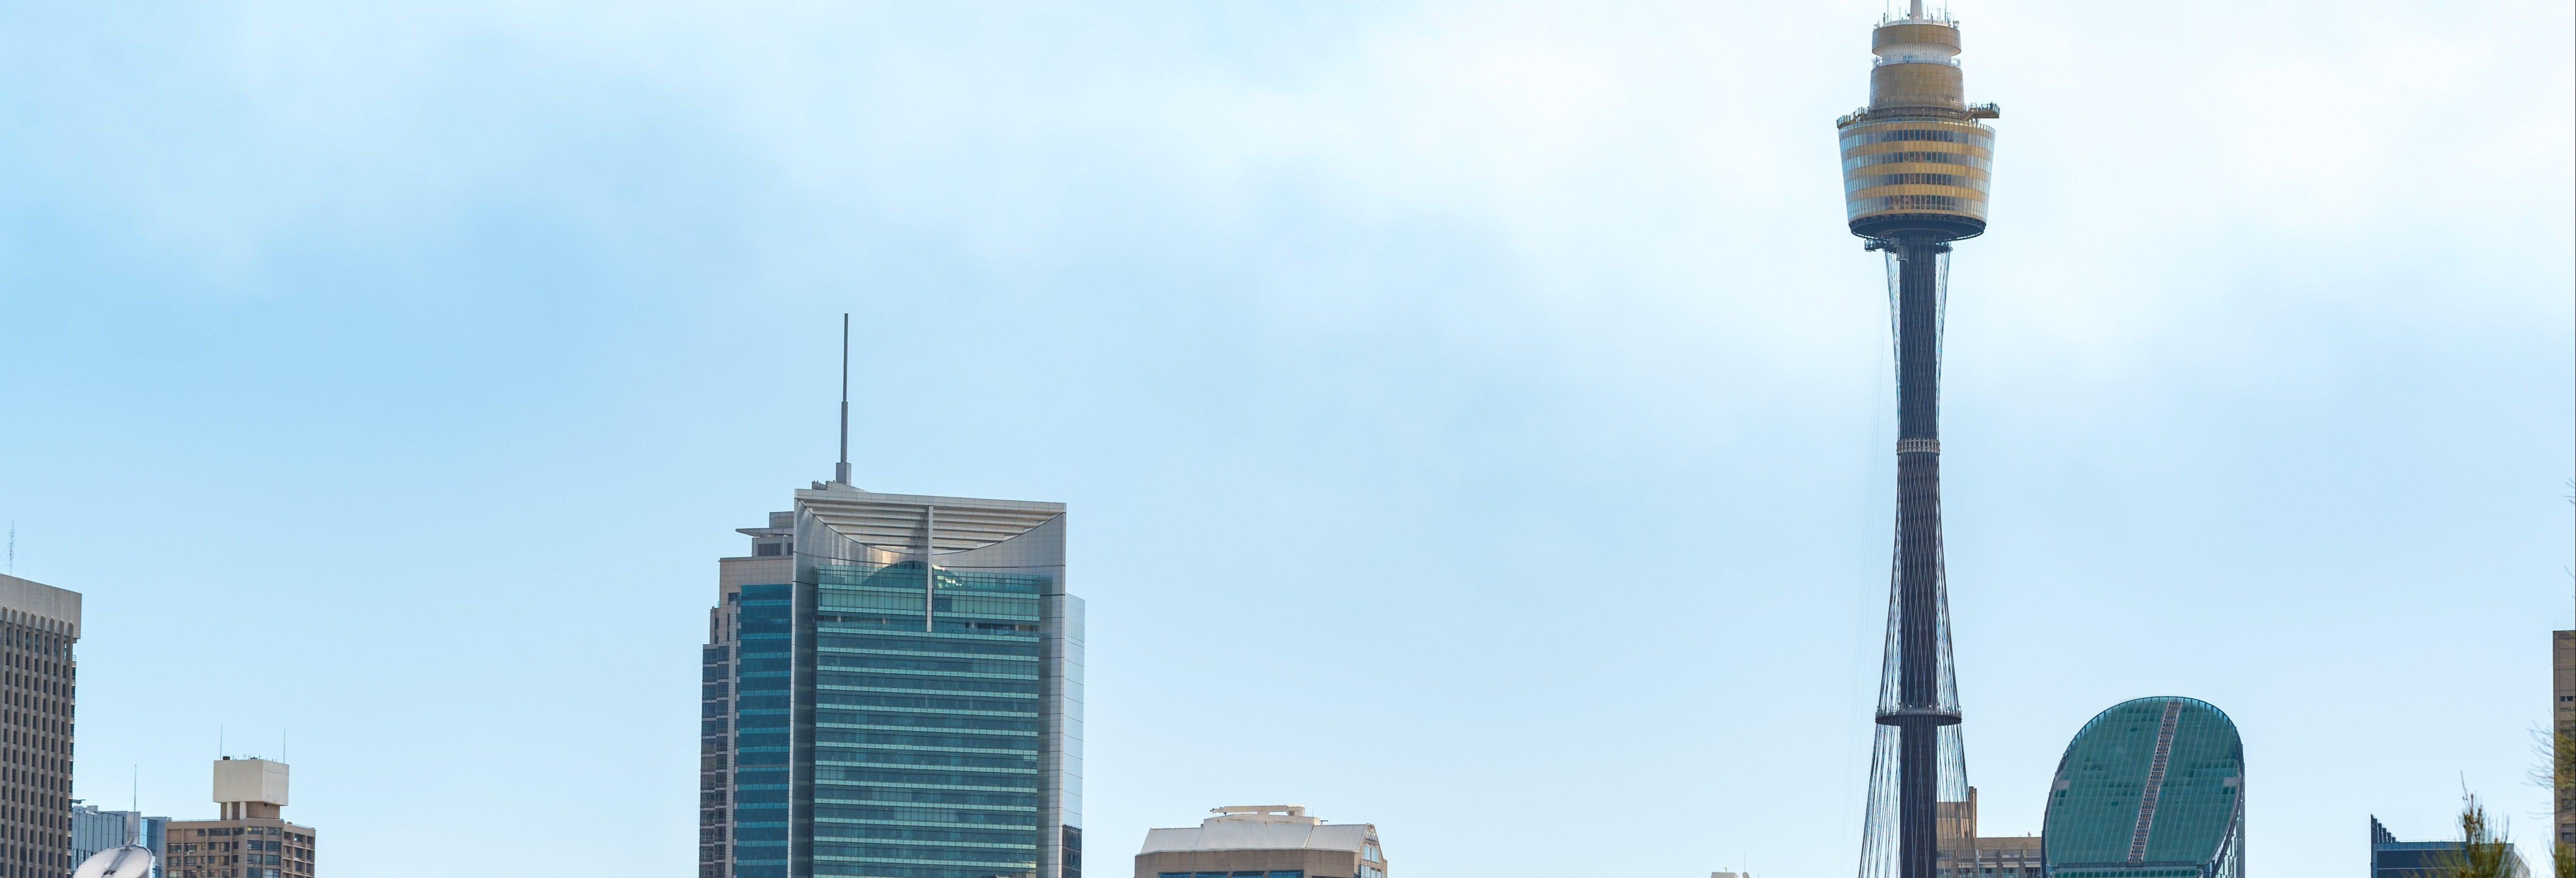 Sydney Tower Ticket